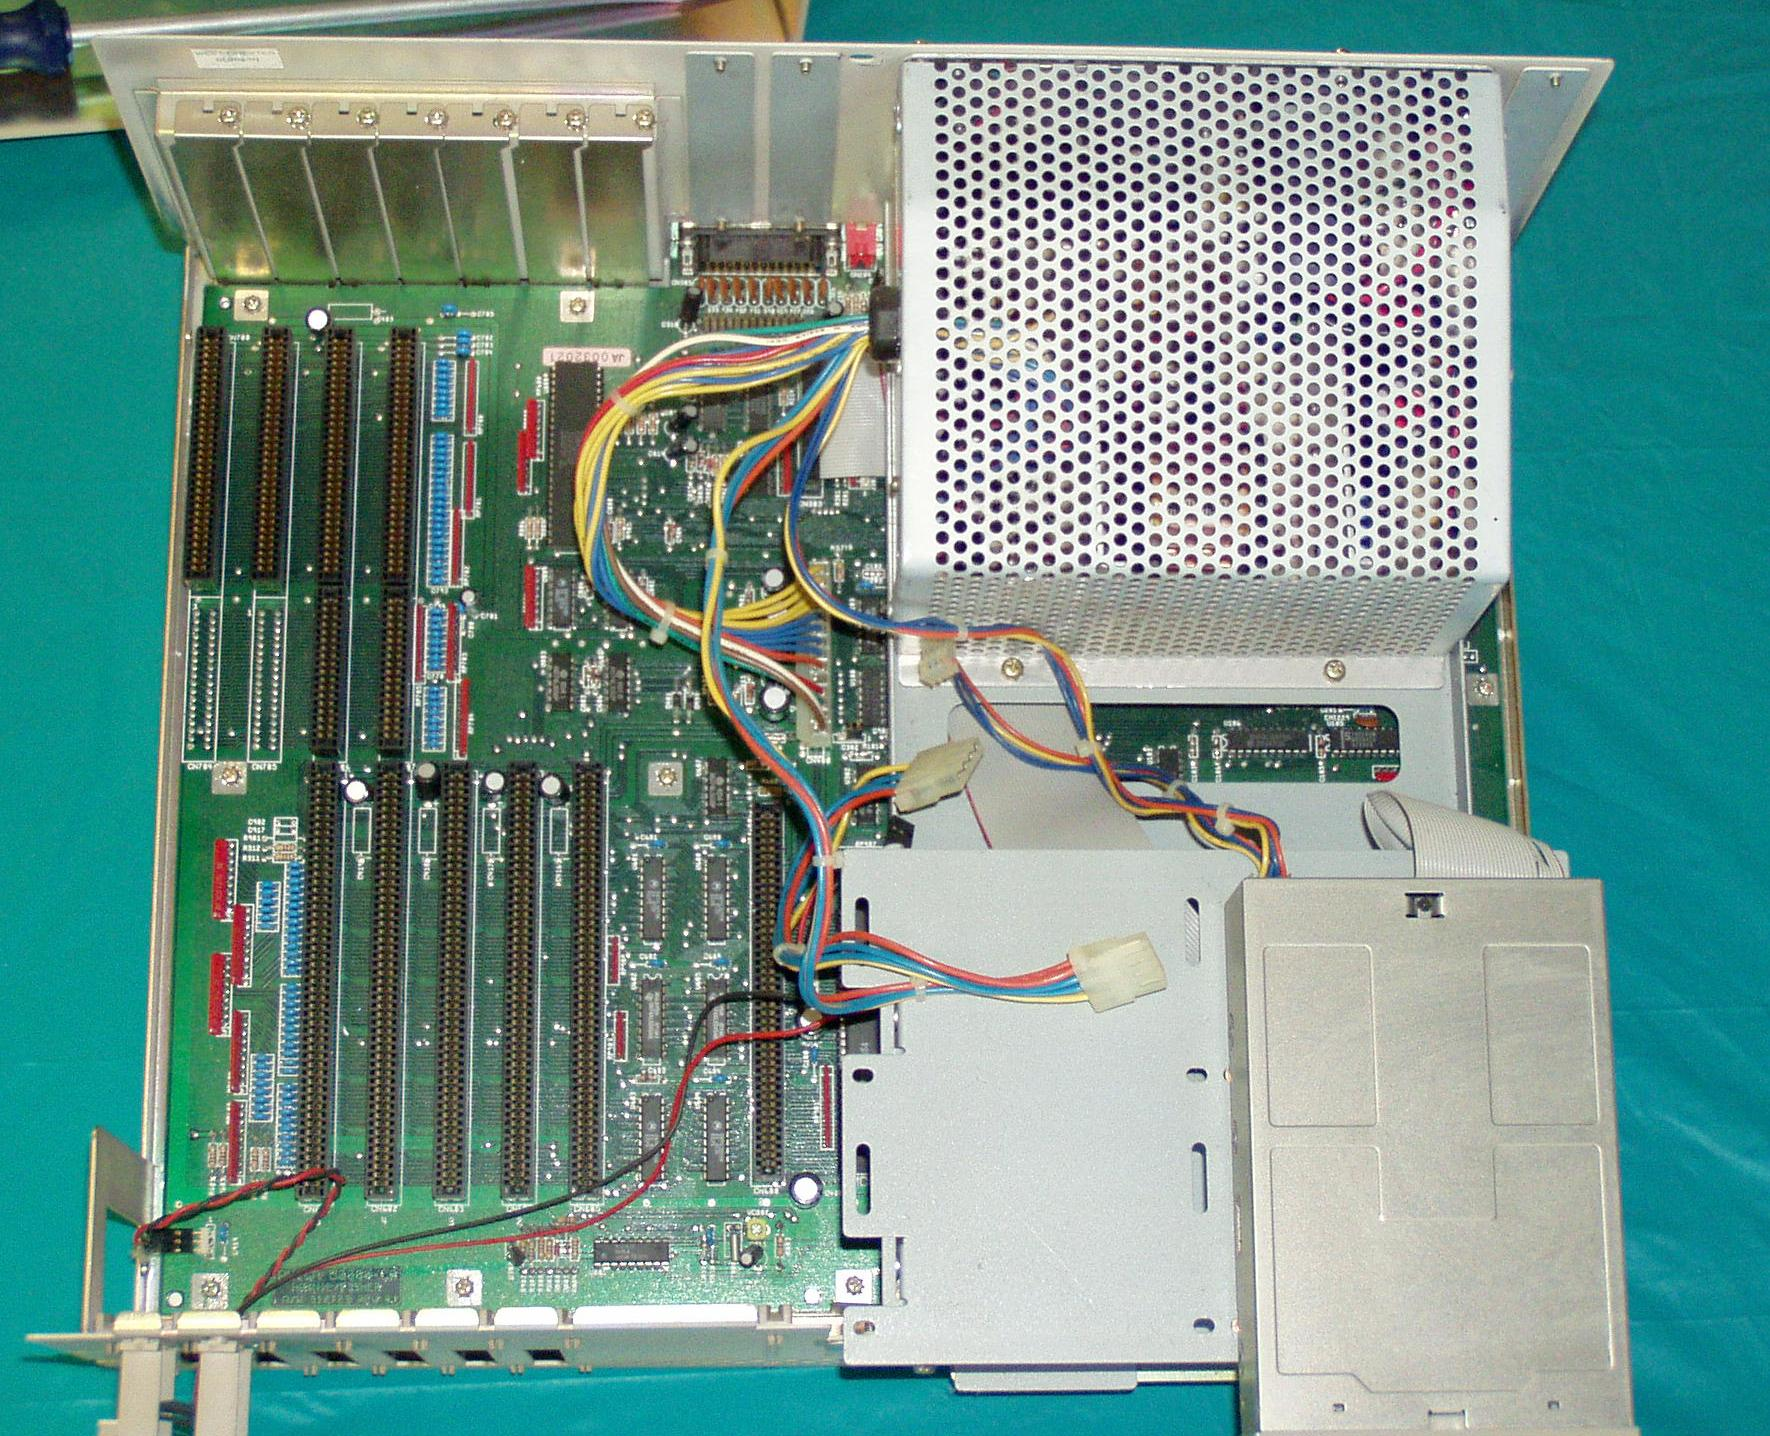 Inside the Amiga 2000.